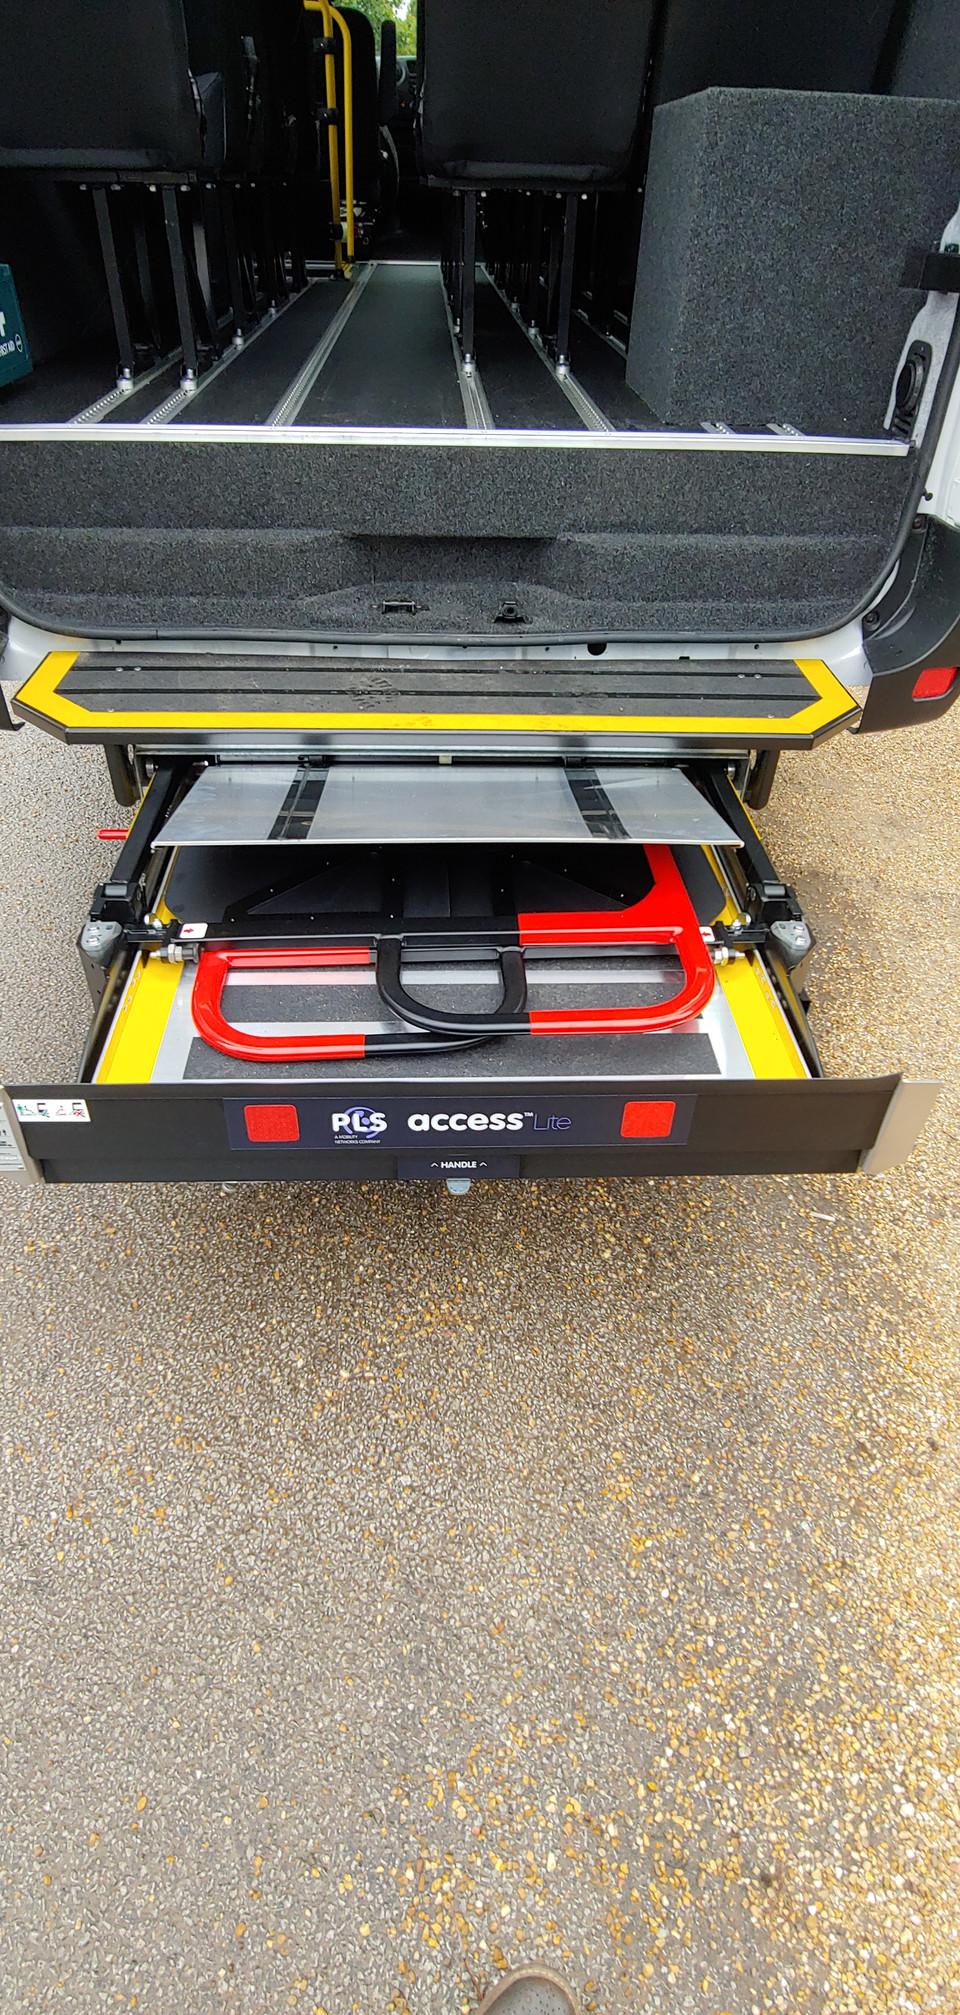 Underfloor hydraulic tail lift